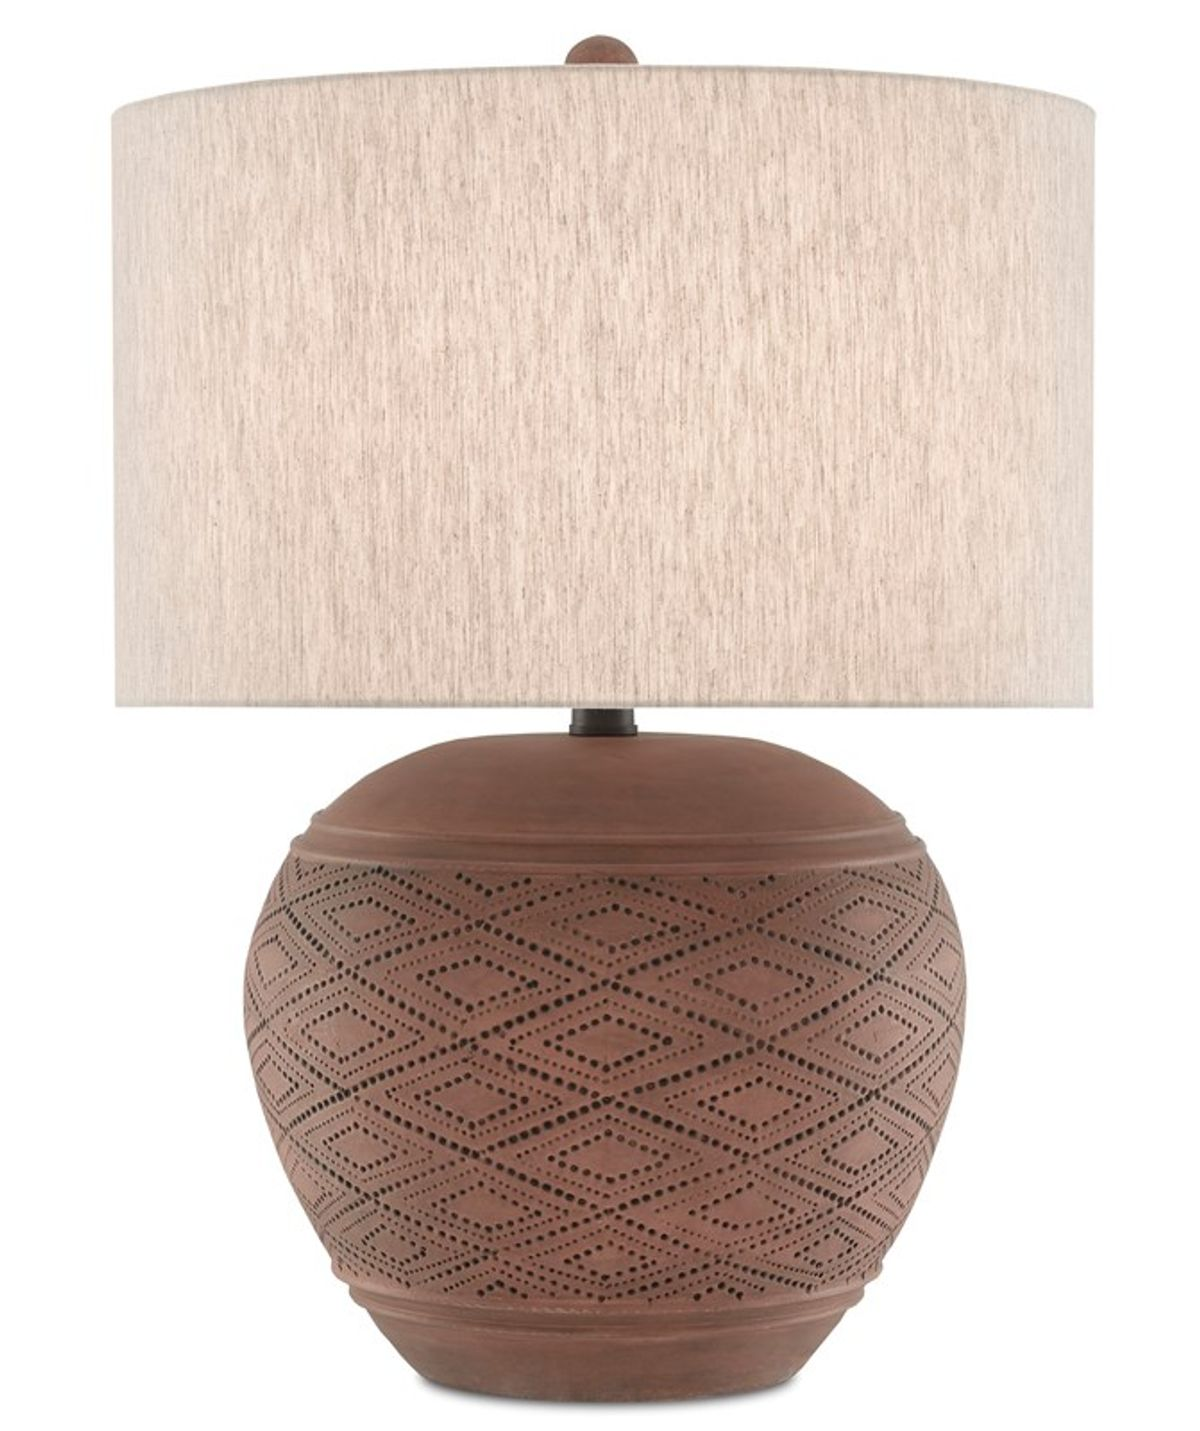 Sunningdale Table Lamp